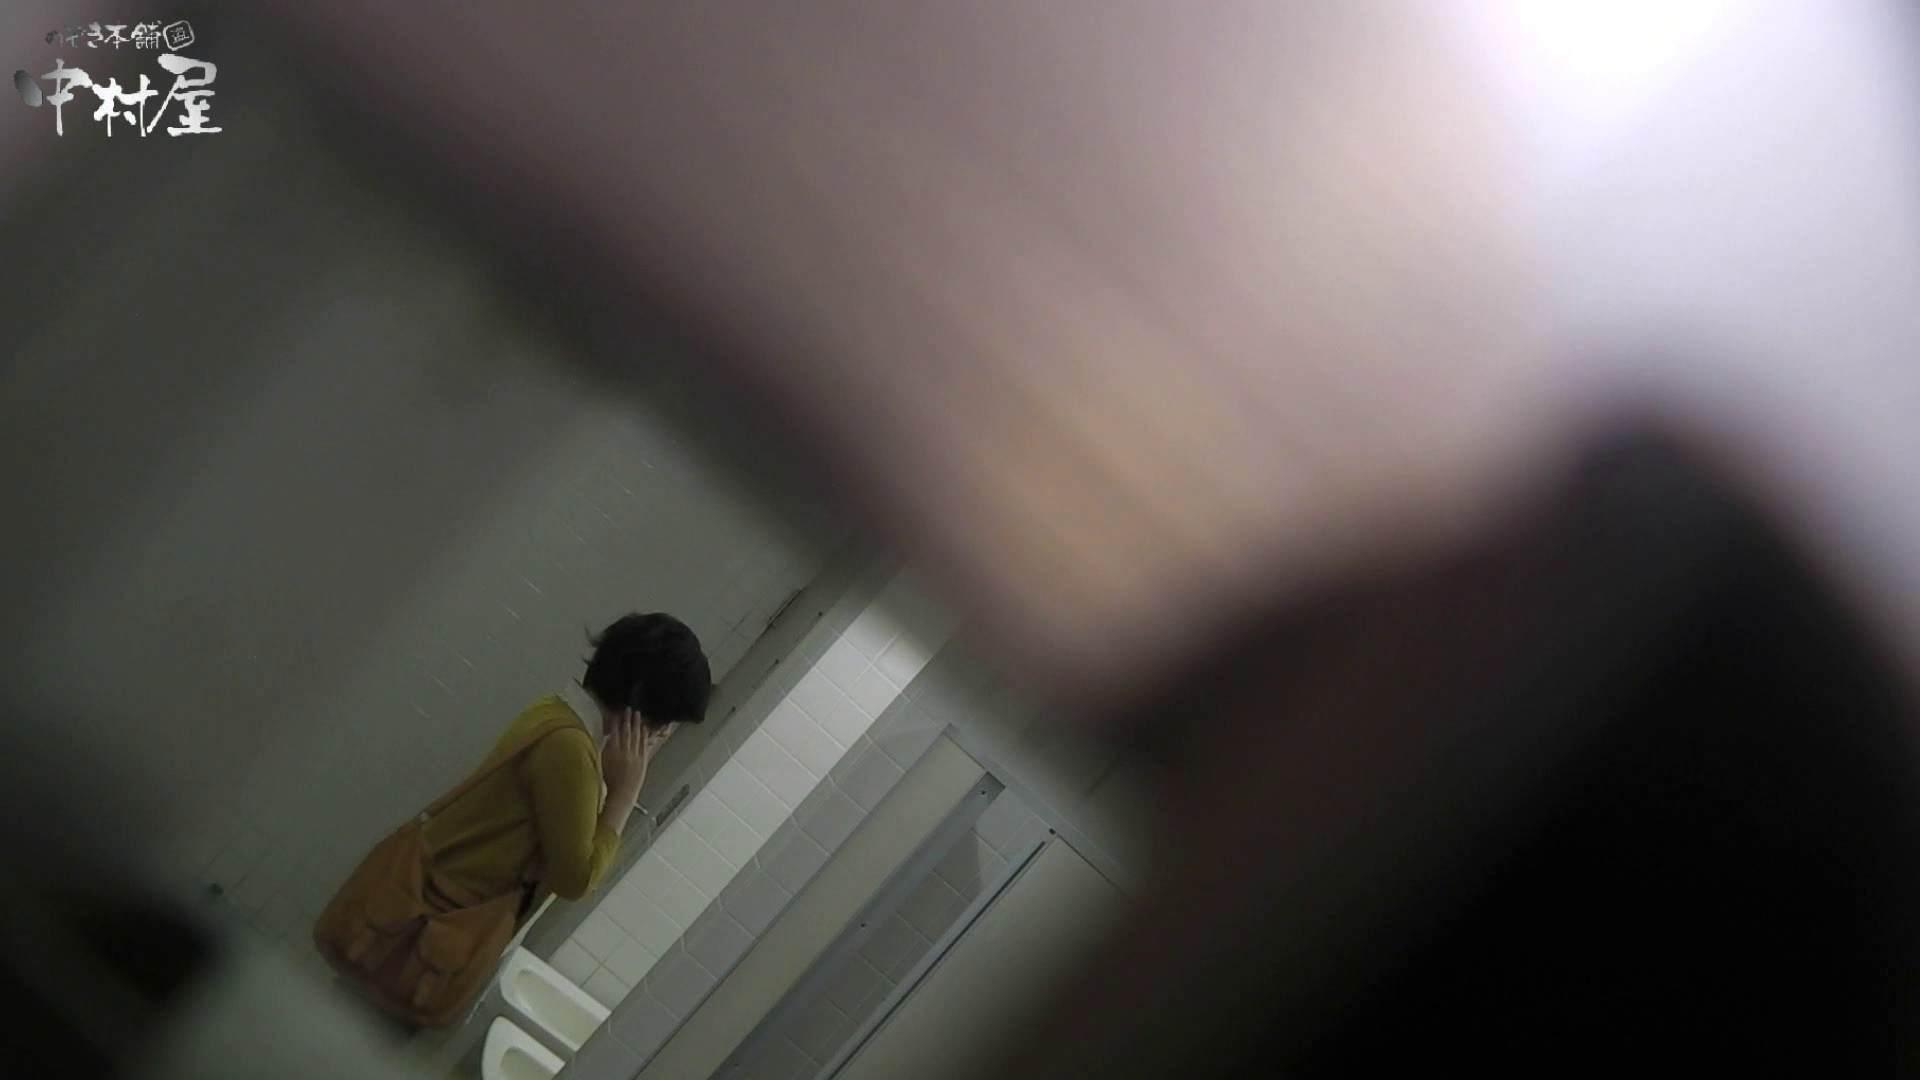 vol.54 命がけ潜伏洗面所! ヲリモノとろりん後編 プライベート アダルト動画キャプチャ 93連発 75